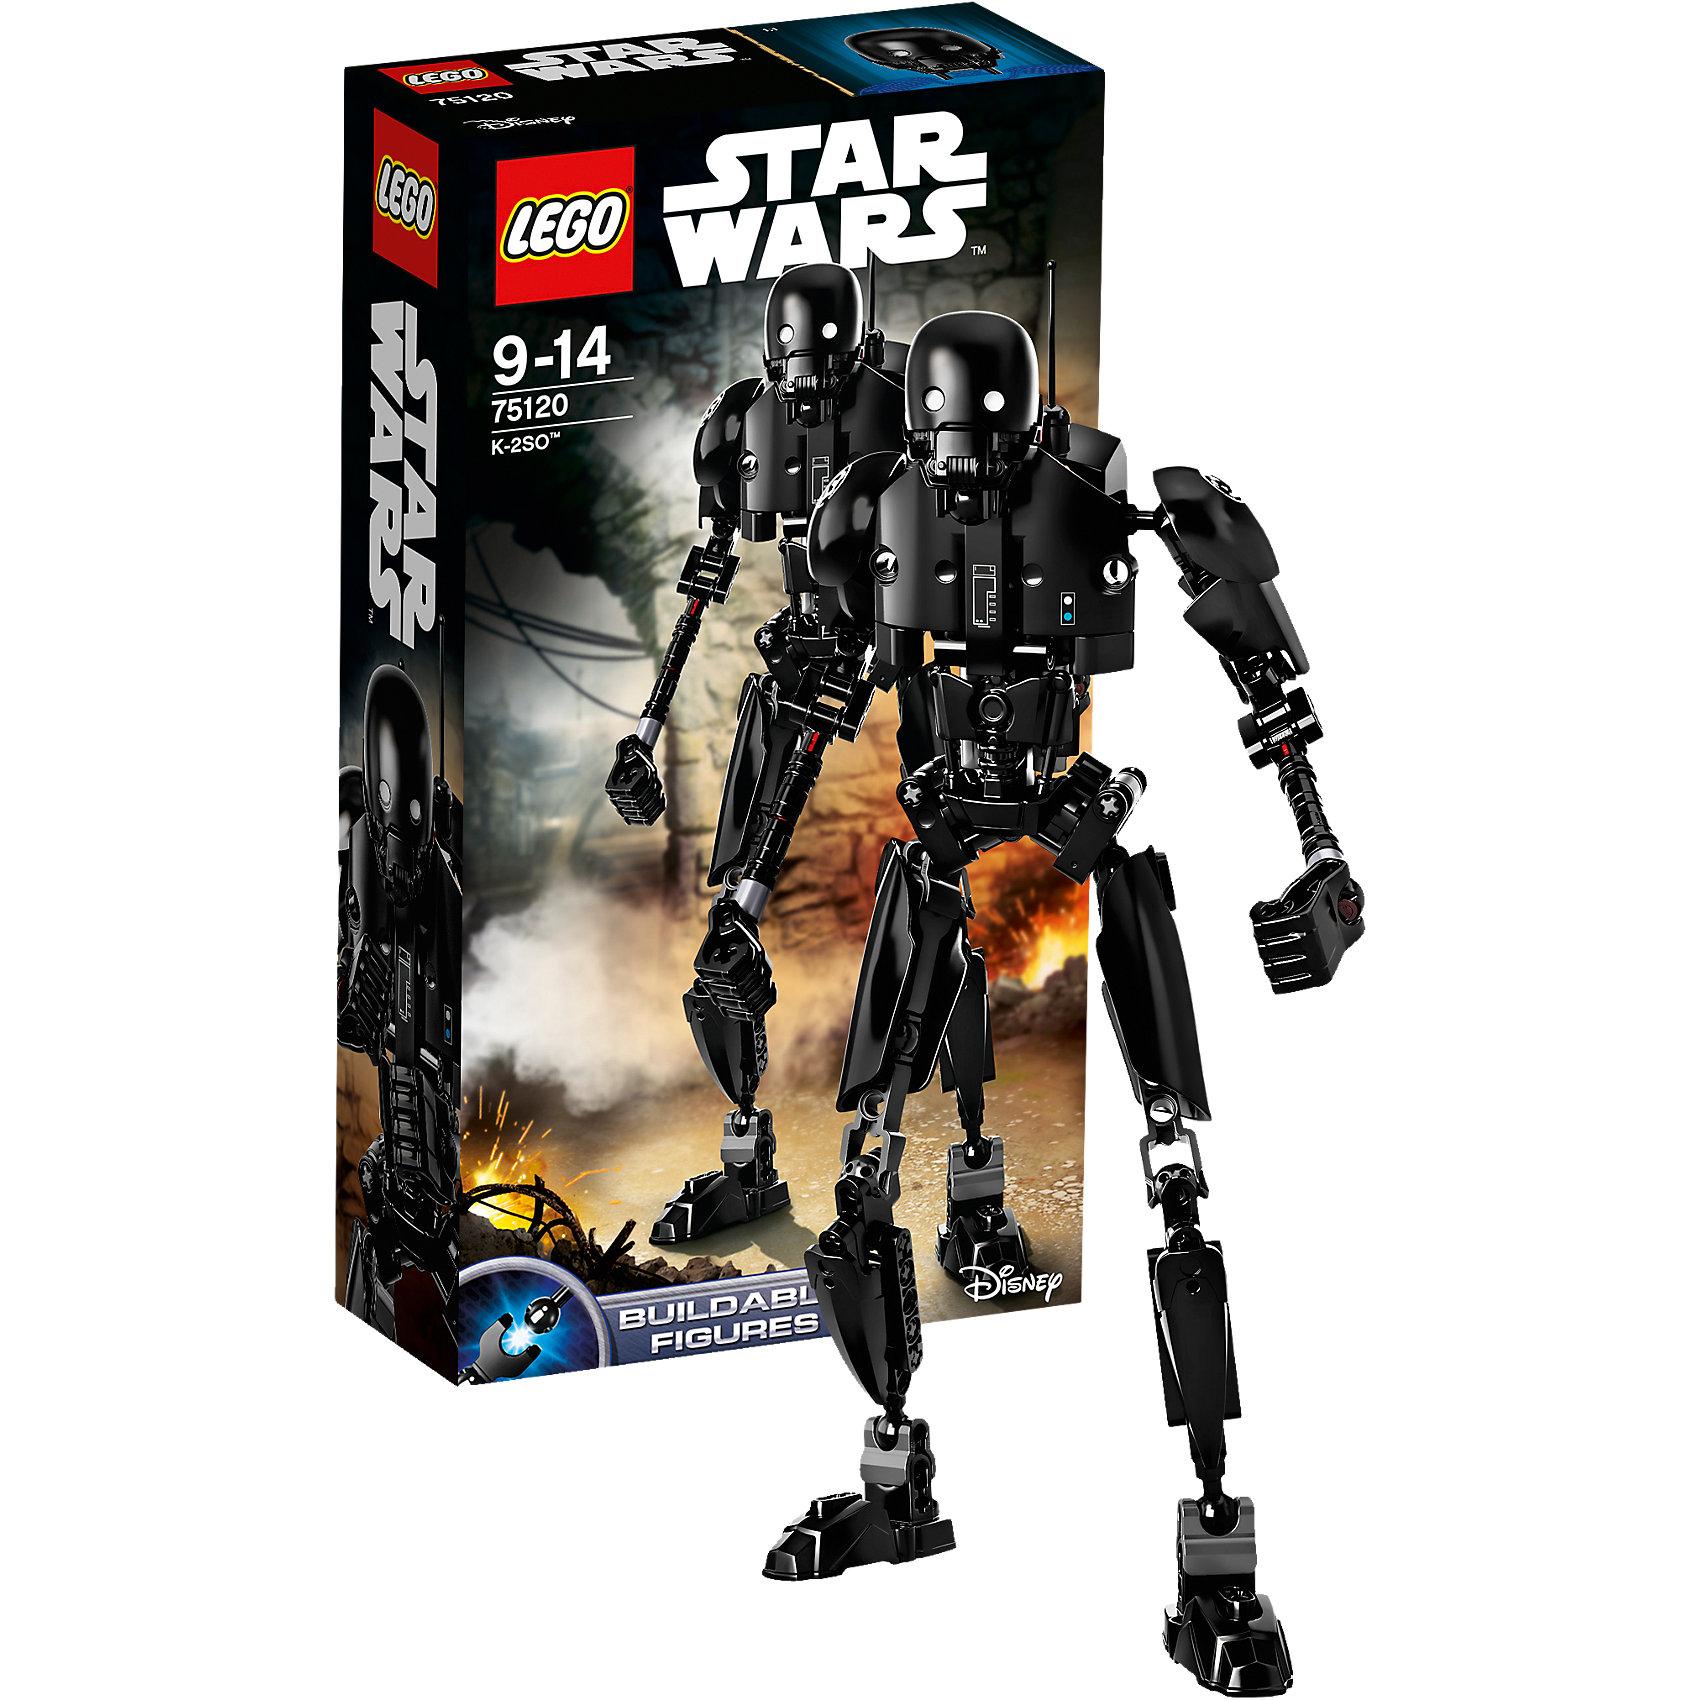 LEGO LEGO Star Wars 75120: K-2S0